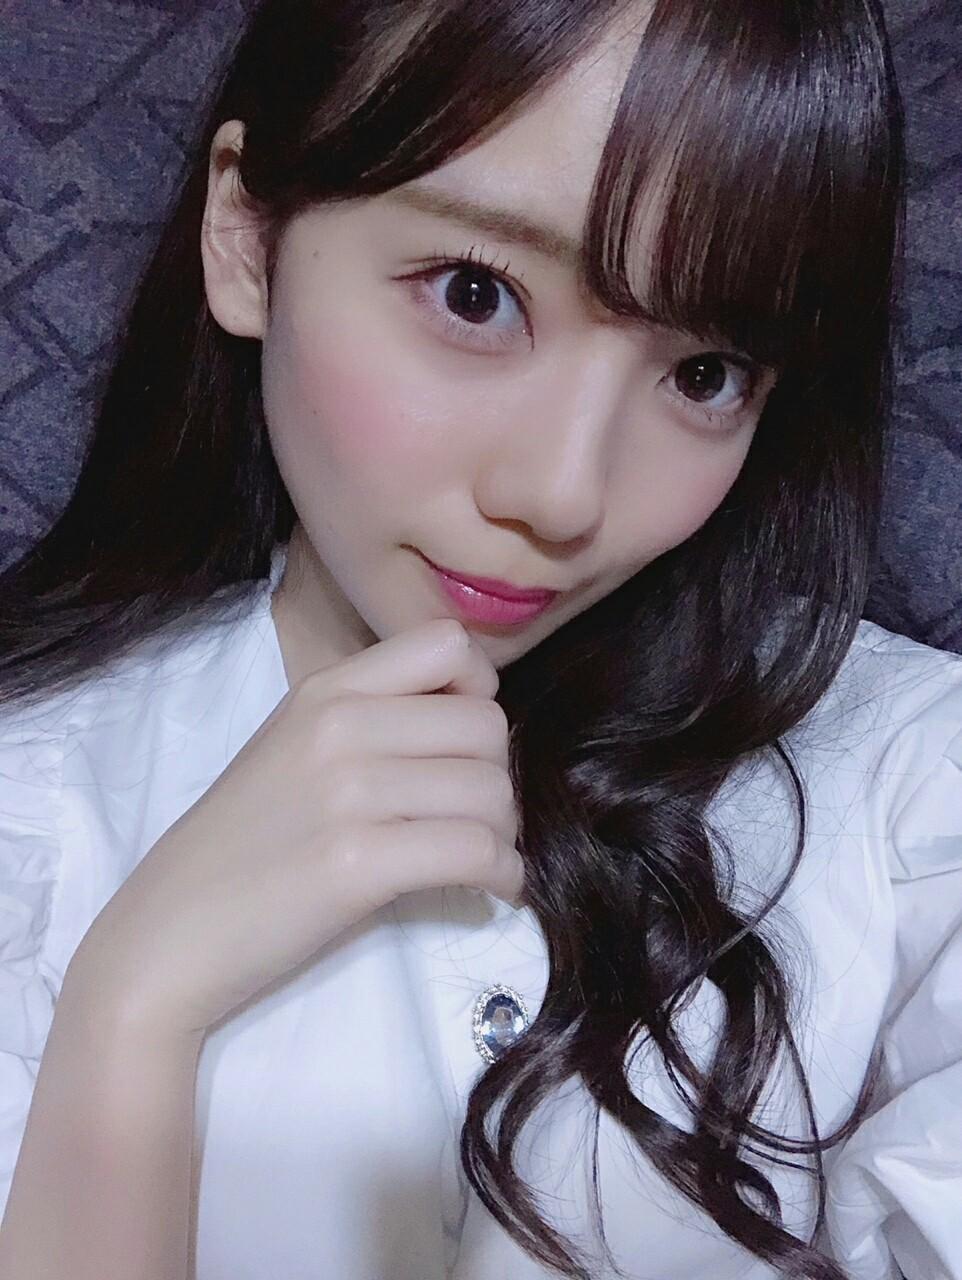 f:id:asitaha46:20180805054053j:image